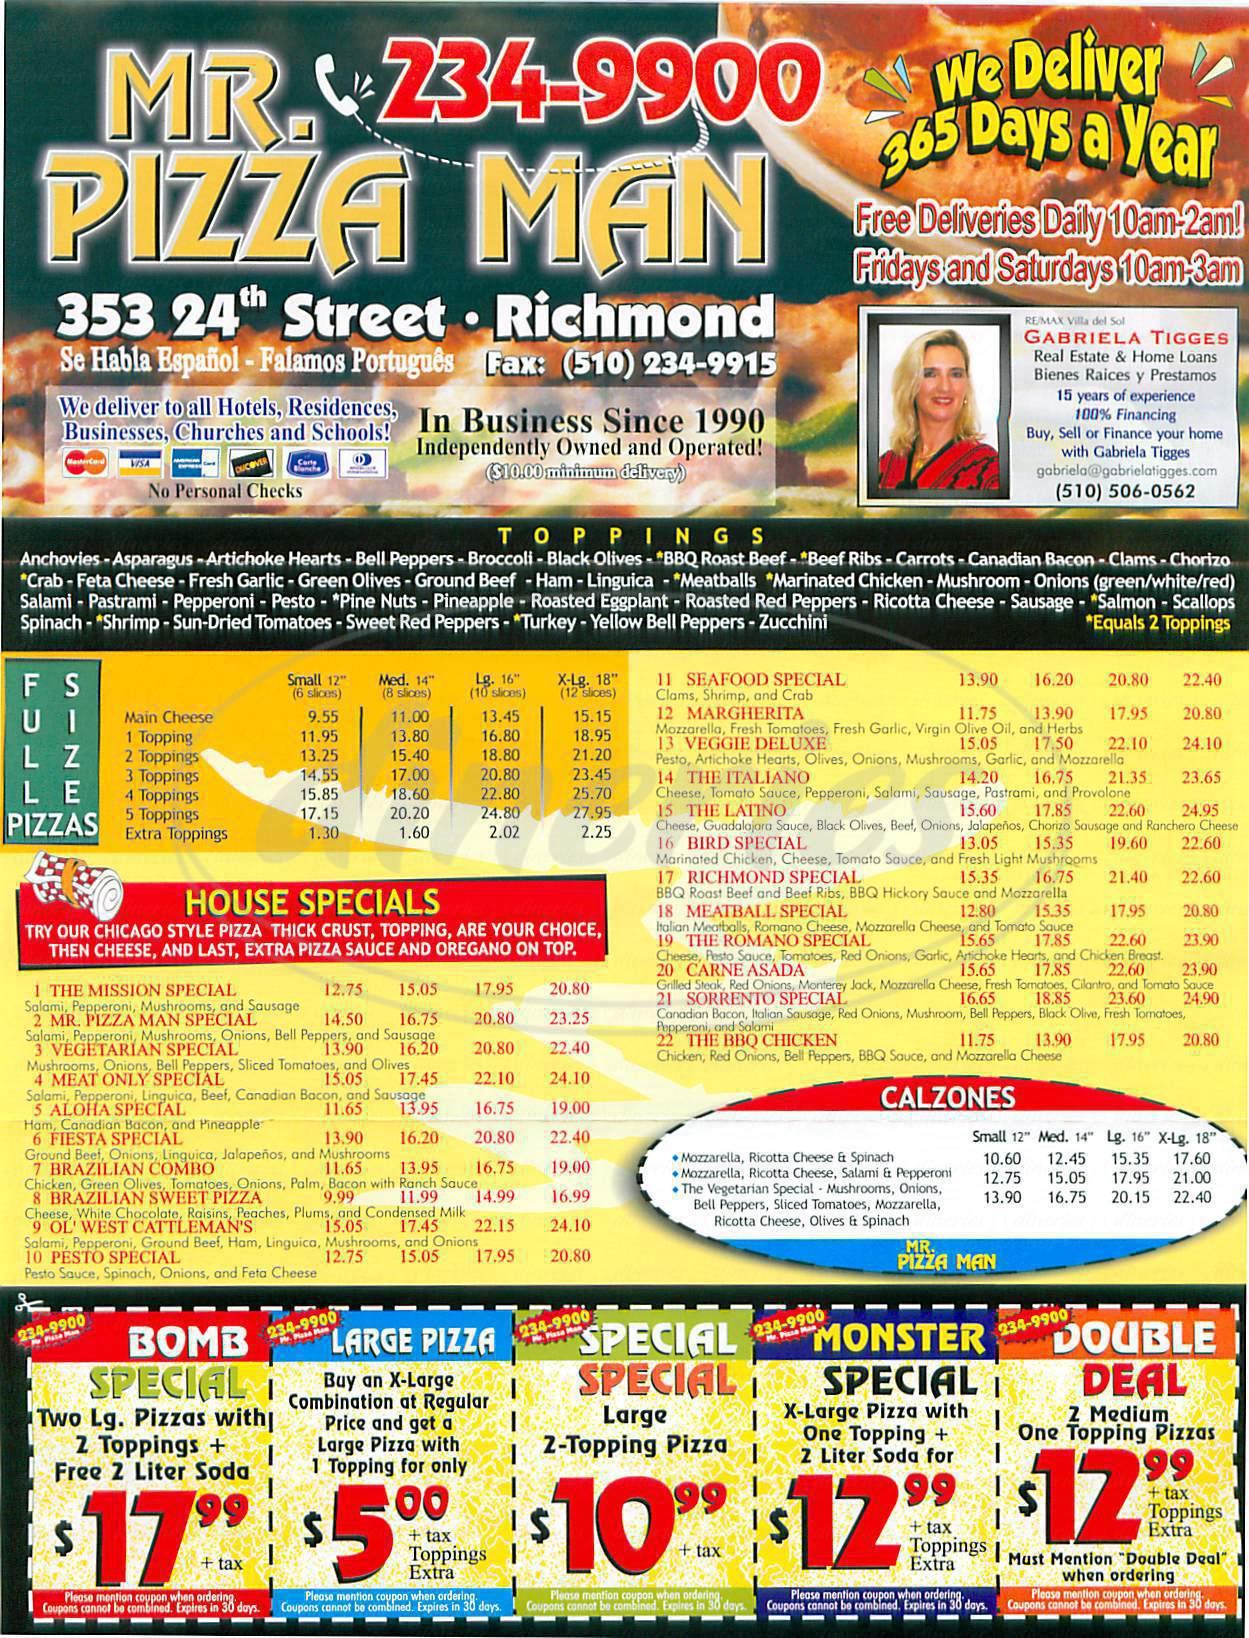 menu for Mr Pizza Man